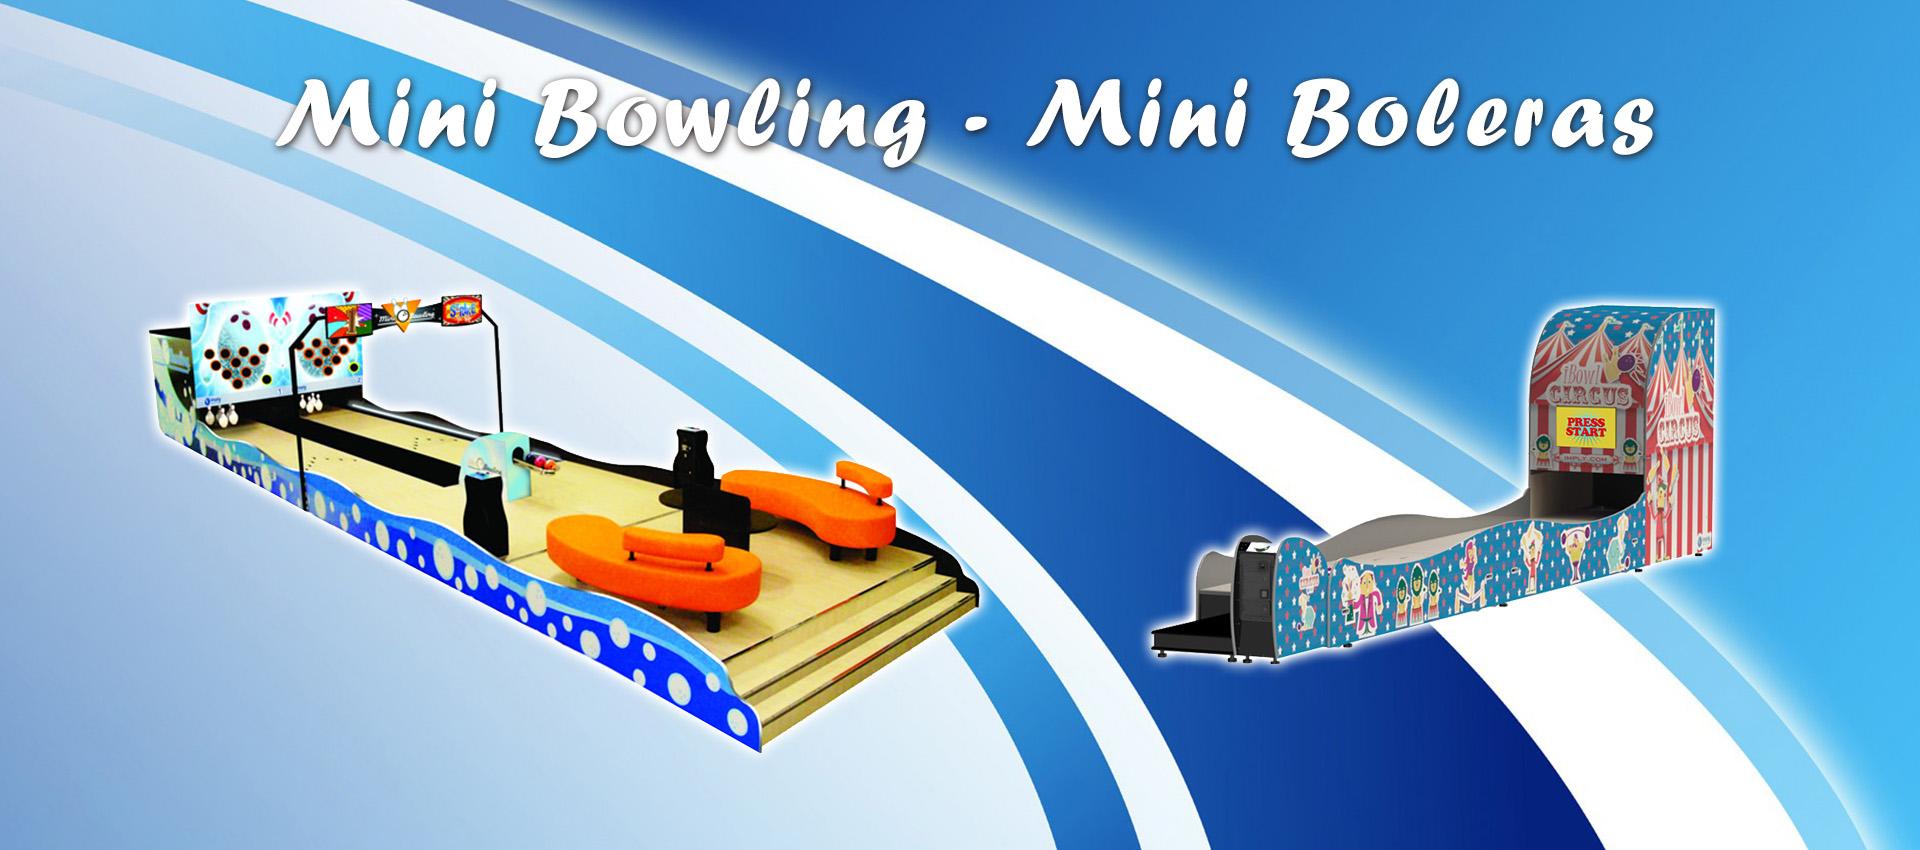 Mini boleras Mini Bowling